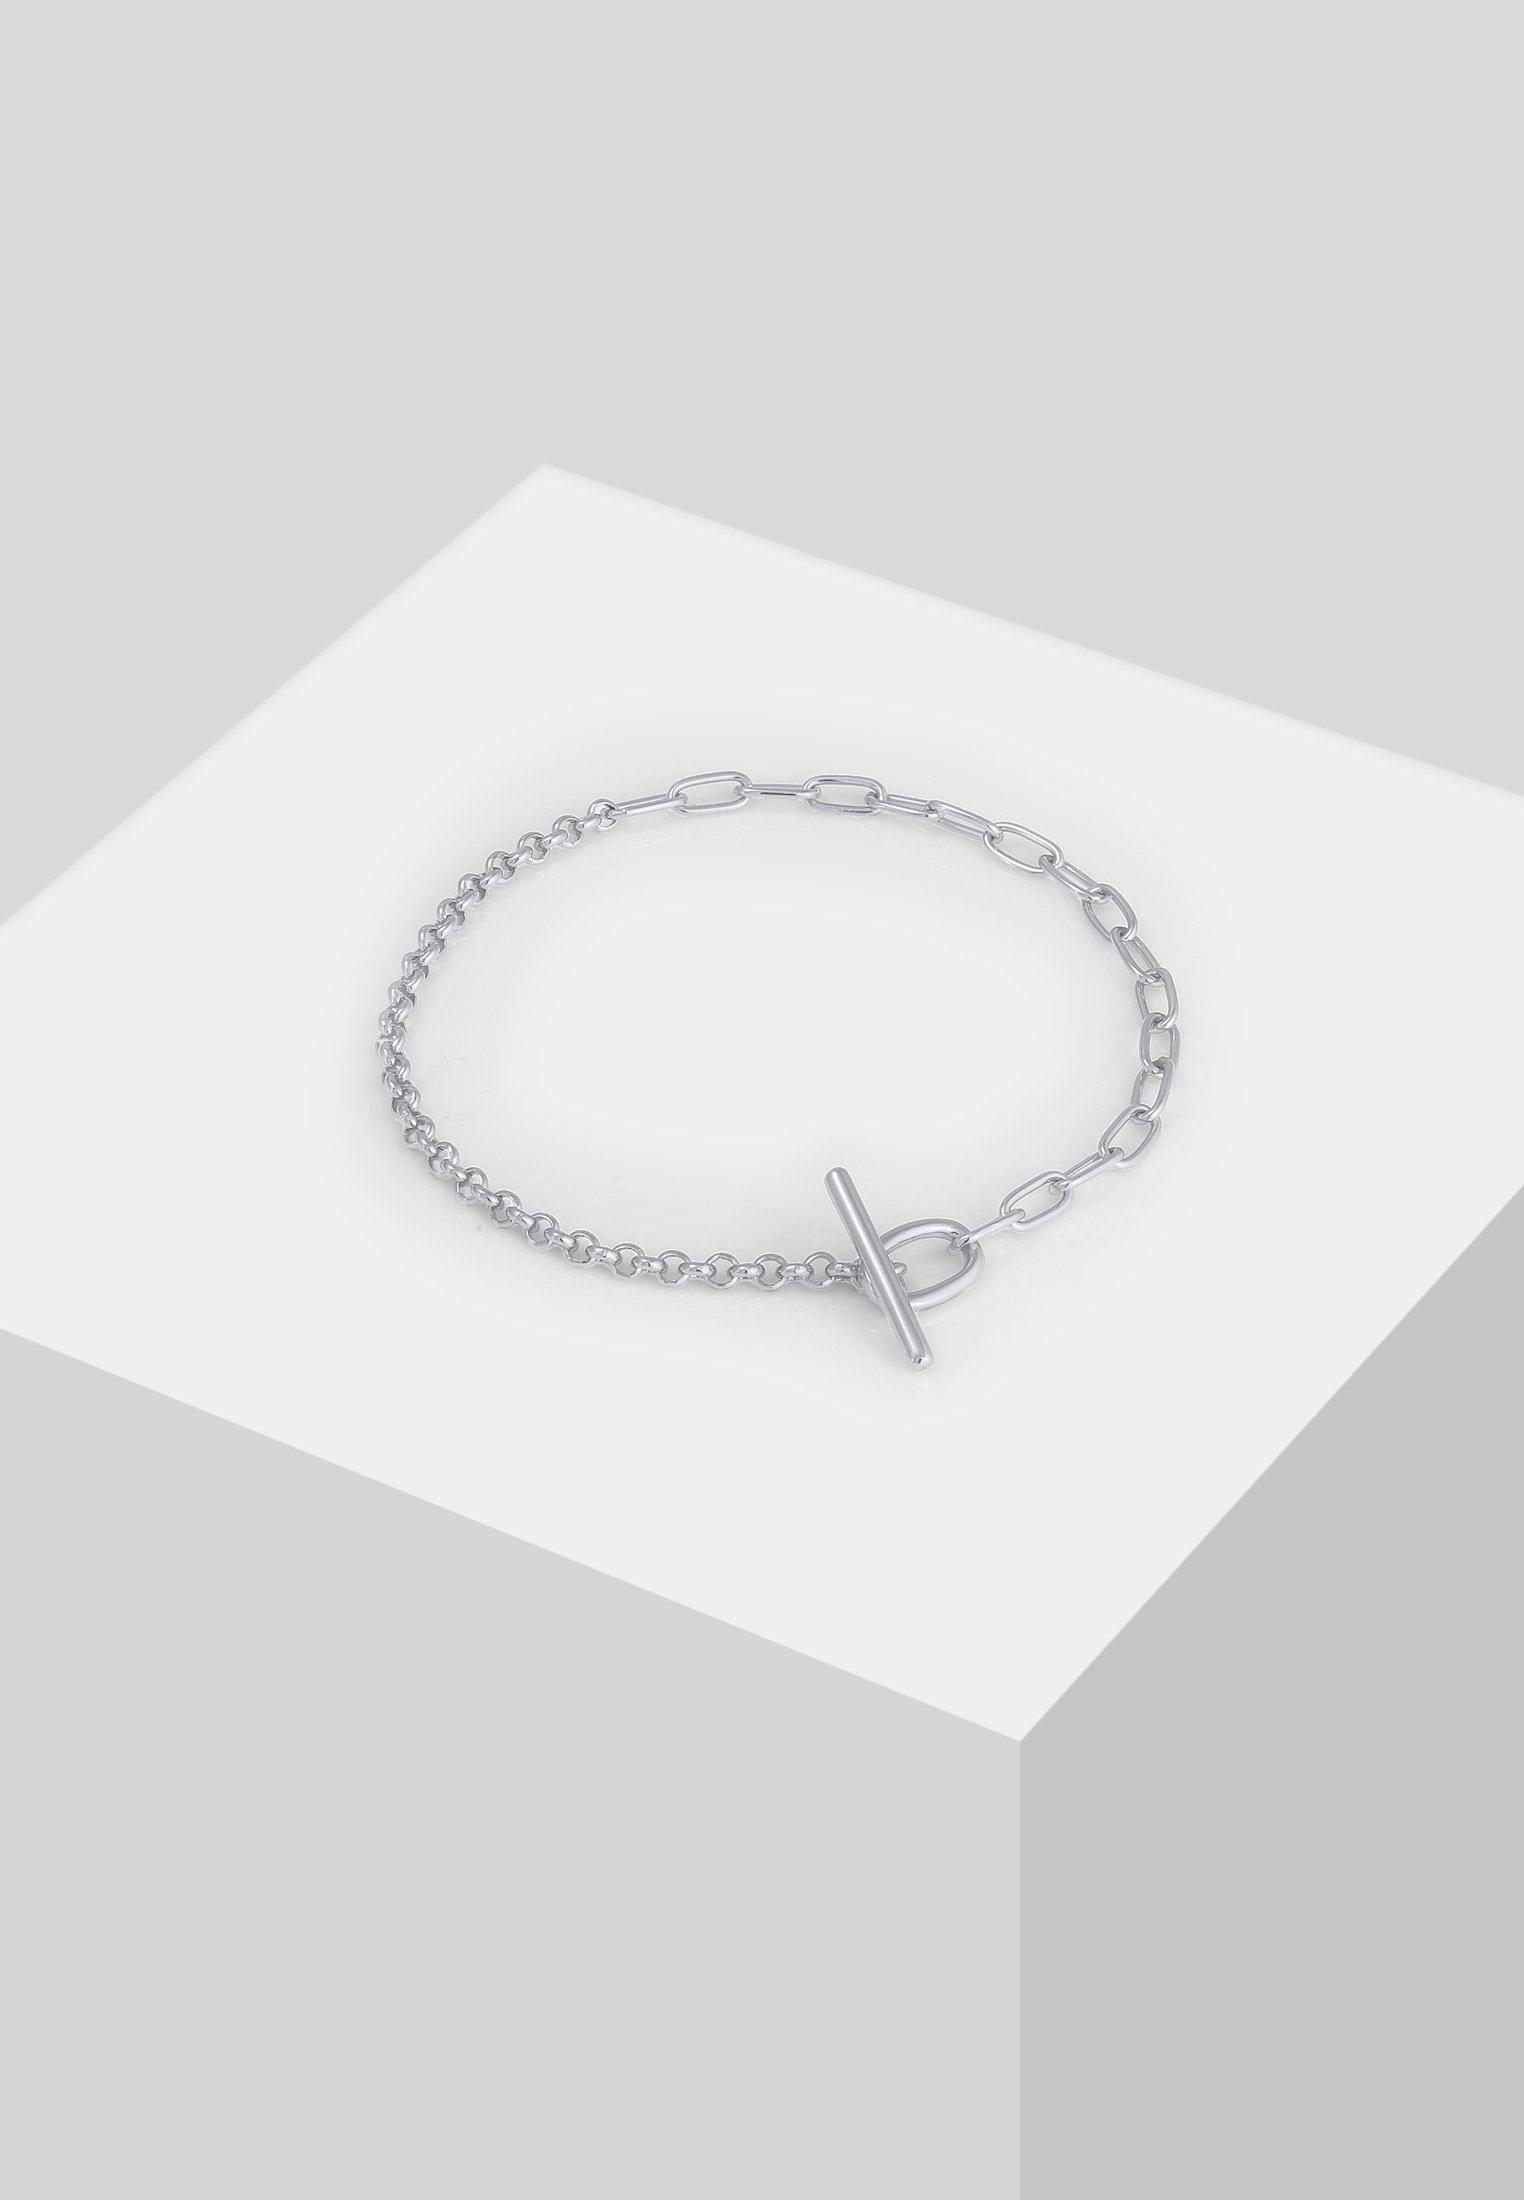 Elli Gliderkette - Armband Silber